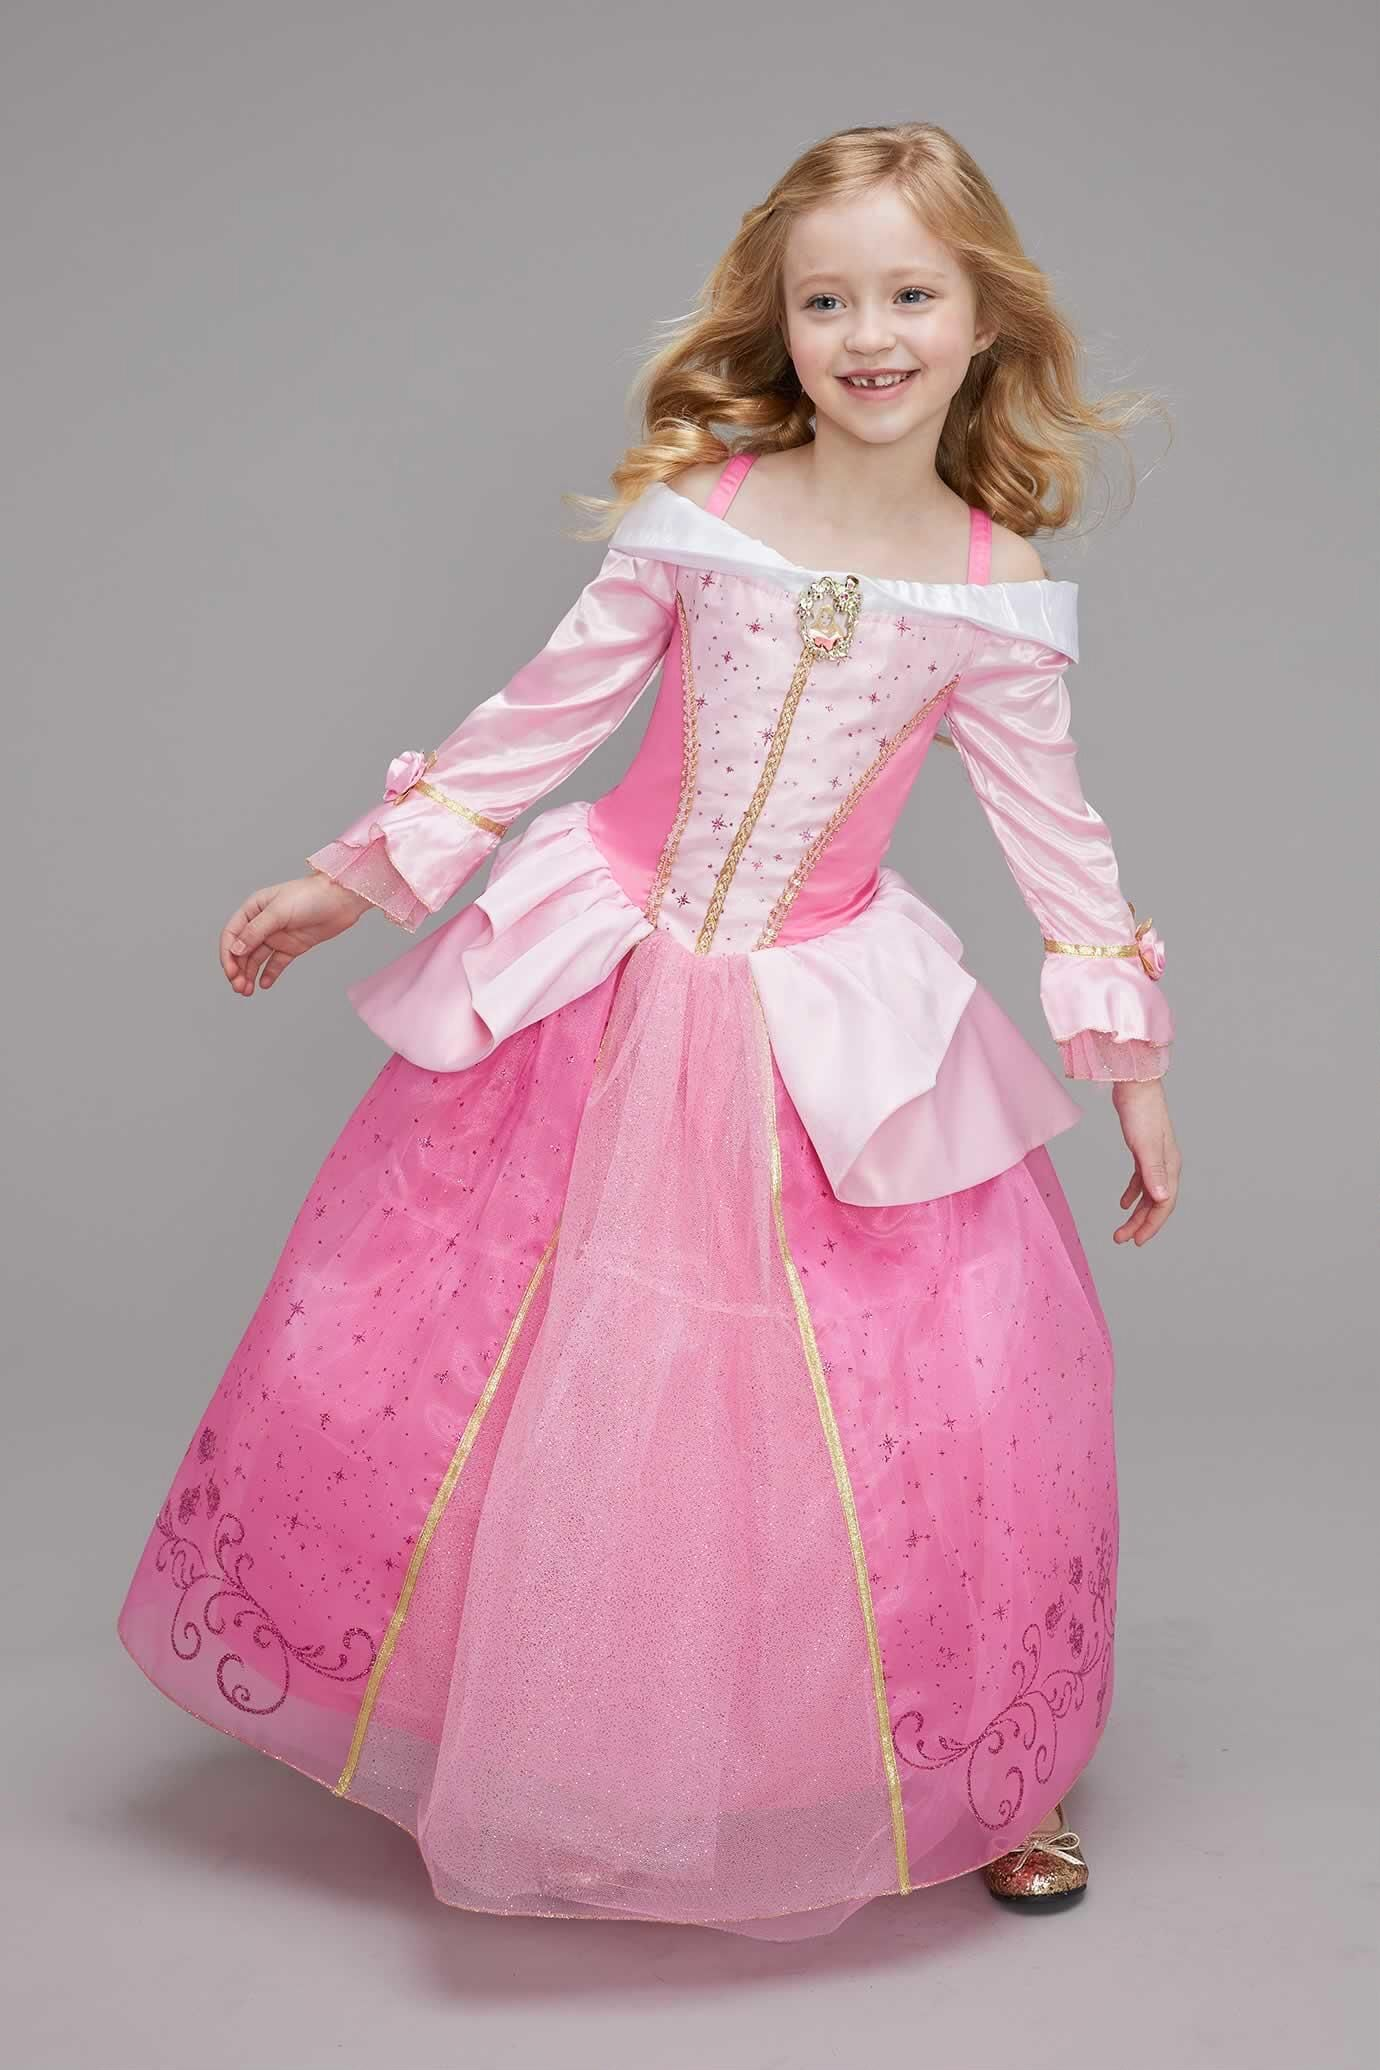 cb593b6ff1669 Princess Aurora Costume for Girls | Halloween | Princess aurora ...